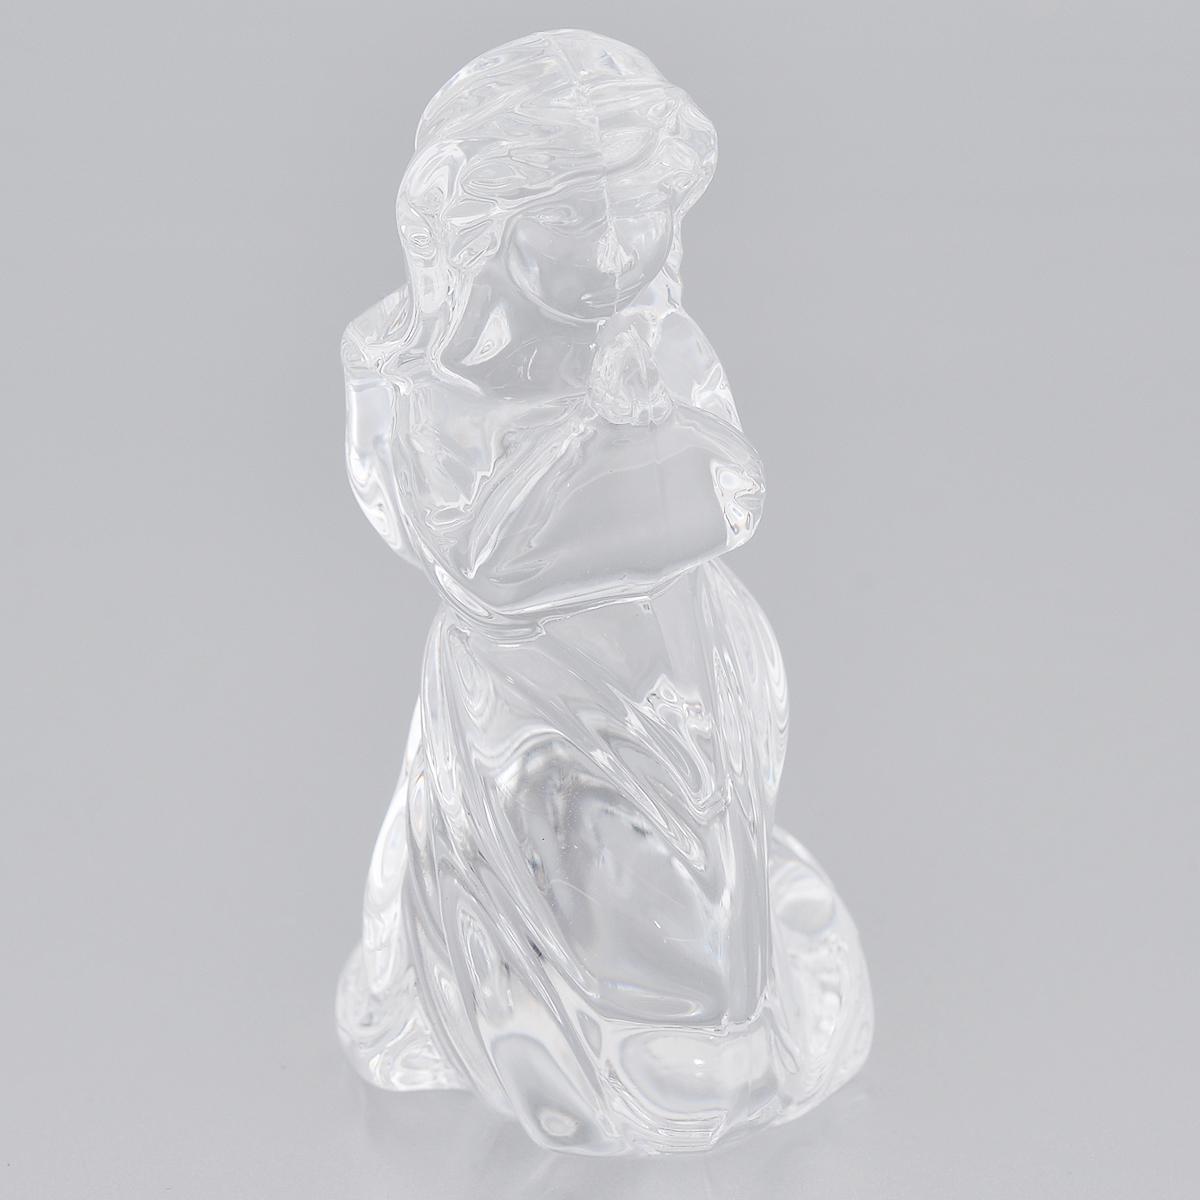 Фигурка декоративная Crystal Bohemia Ангел, высота 8 см